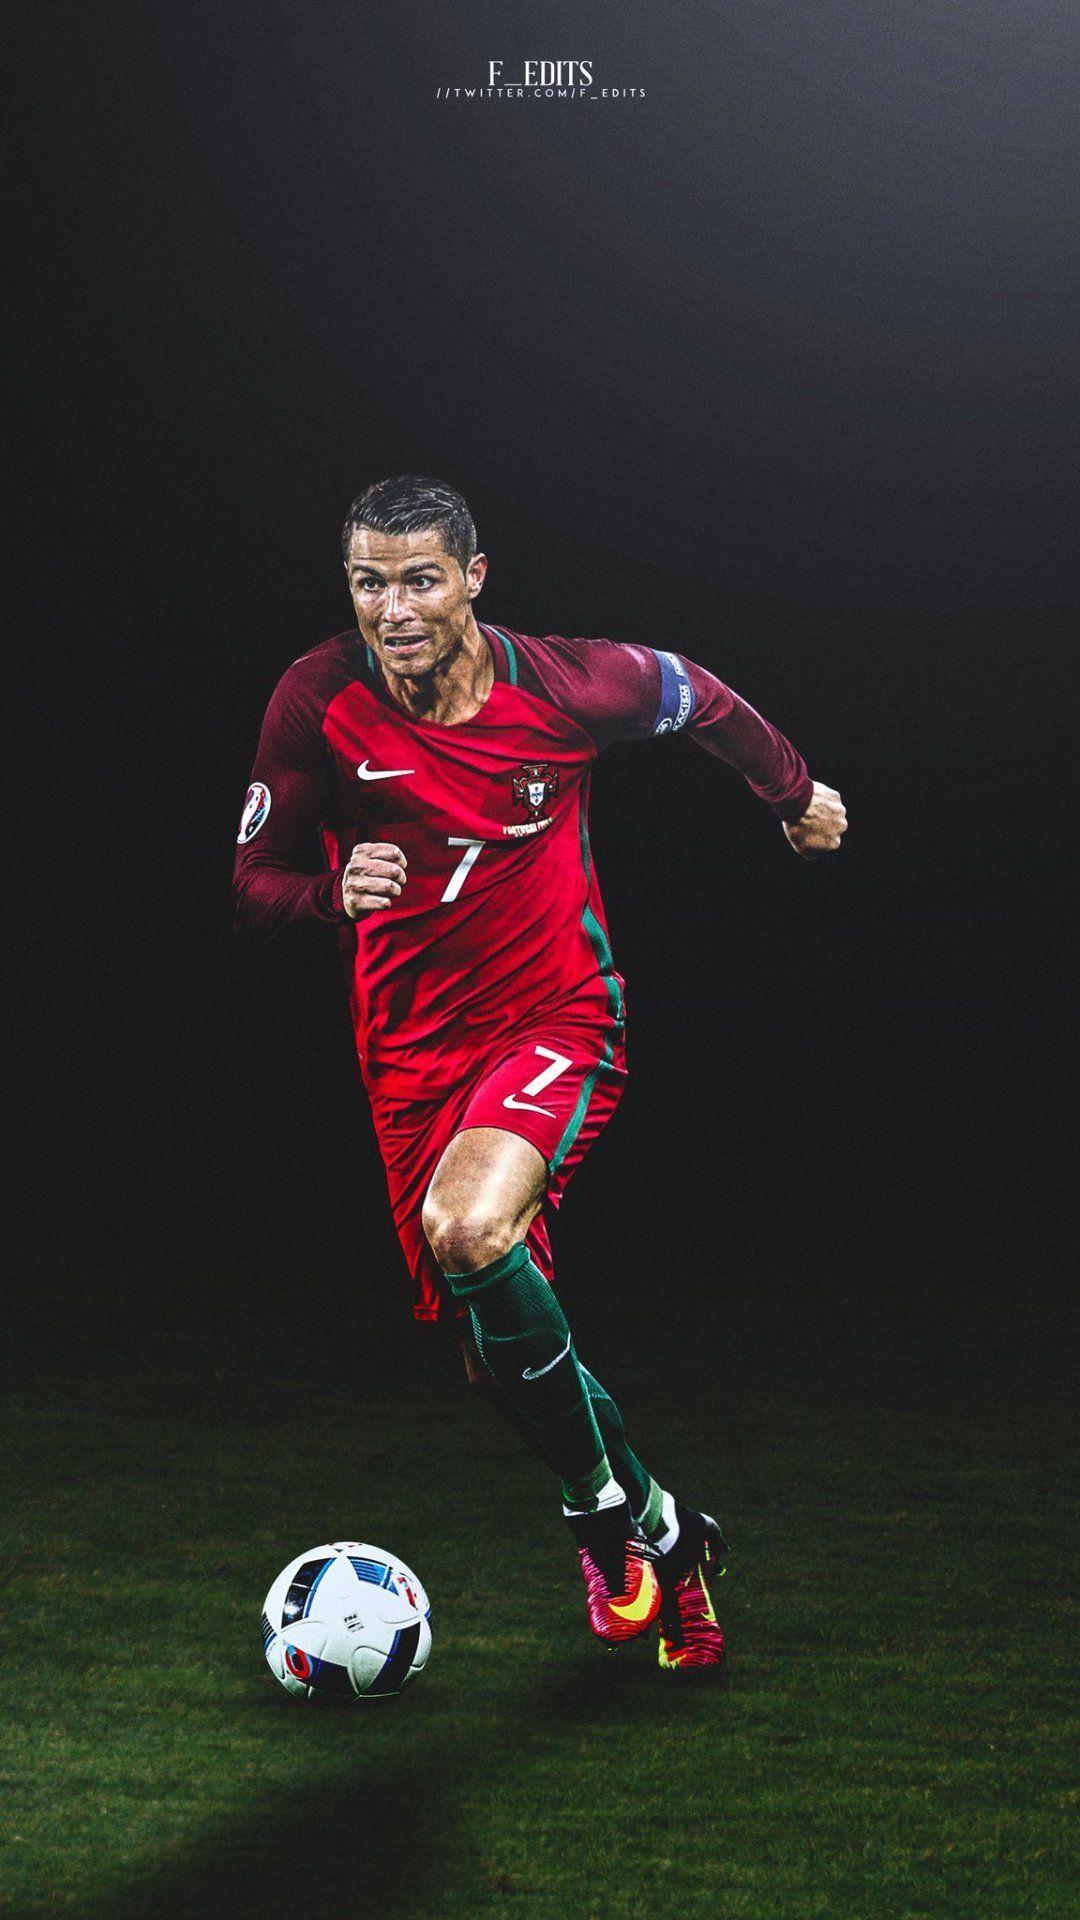 Awesome Cristiano Ronaldo Iphone 7 Wallpaper Images In 2020 Ronaldo Wallpapers Cristiano Ronaldo Wallpapers Cristiano Ronaldo Portugal